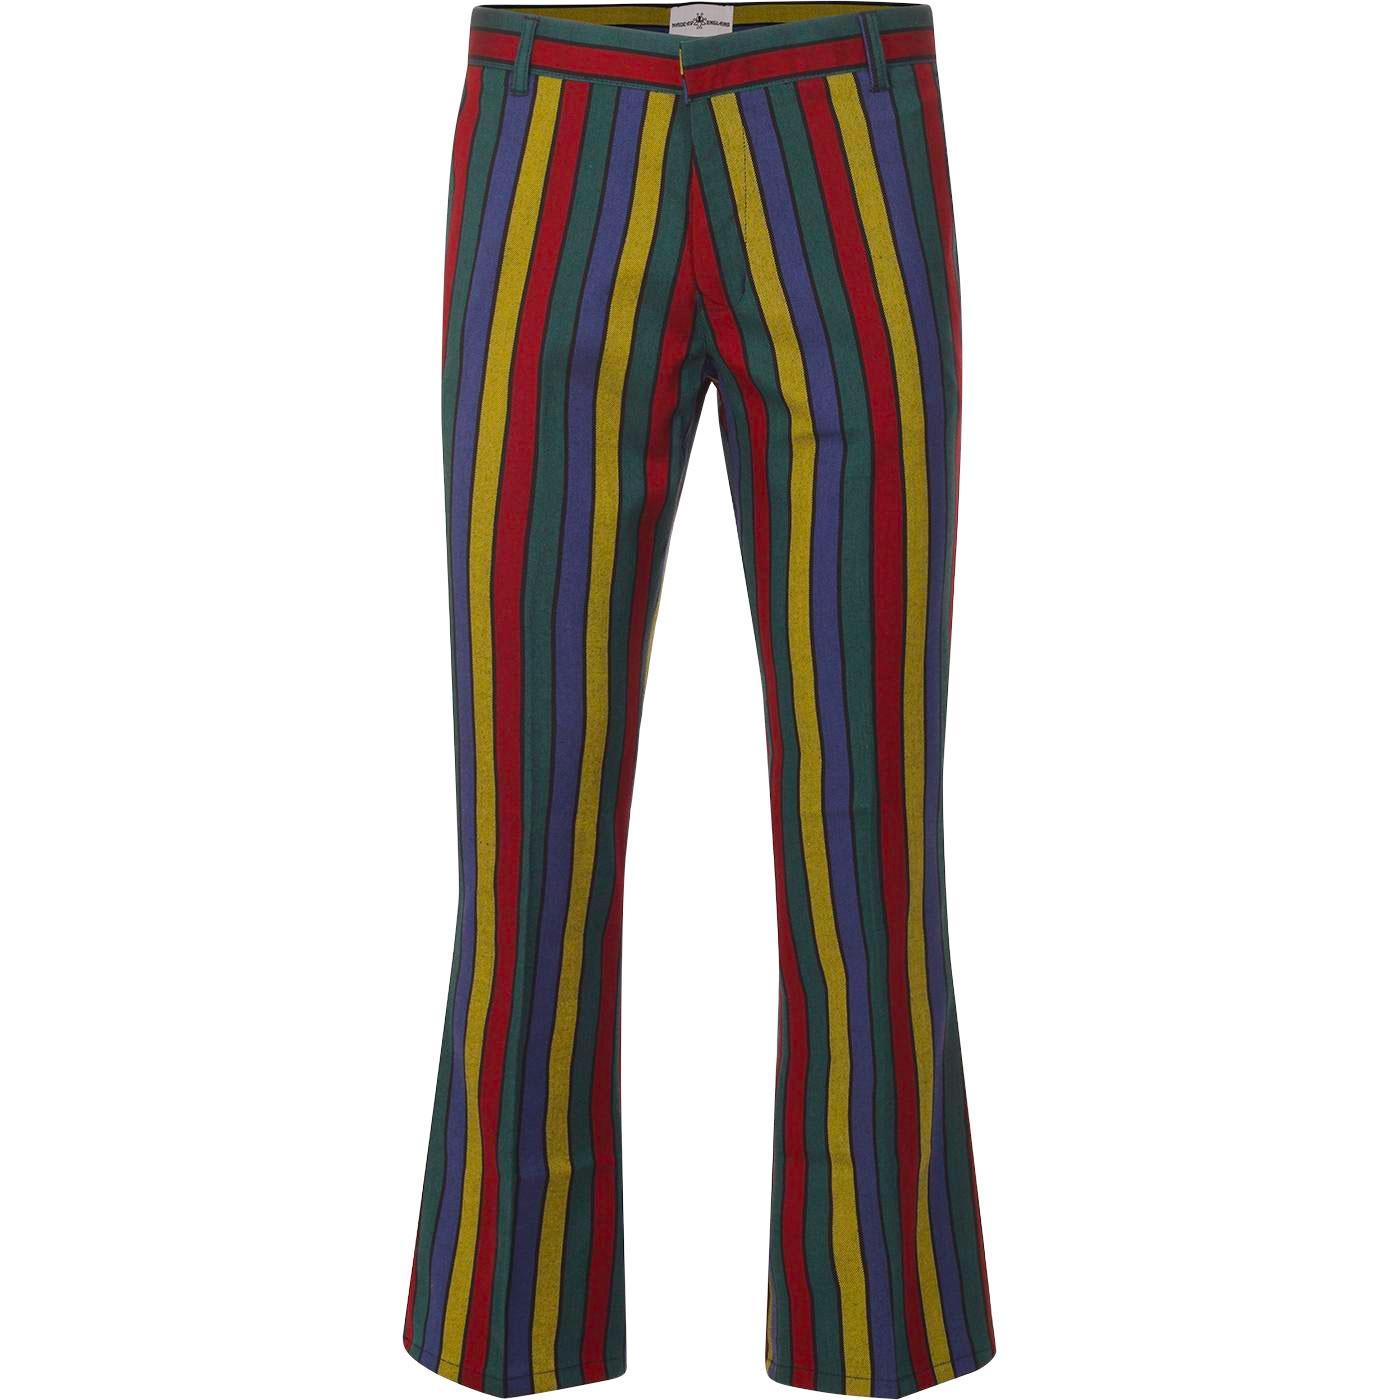 Hendrix Stripe MADCAP ENGLAND Retro 60s Flares